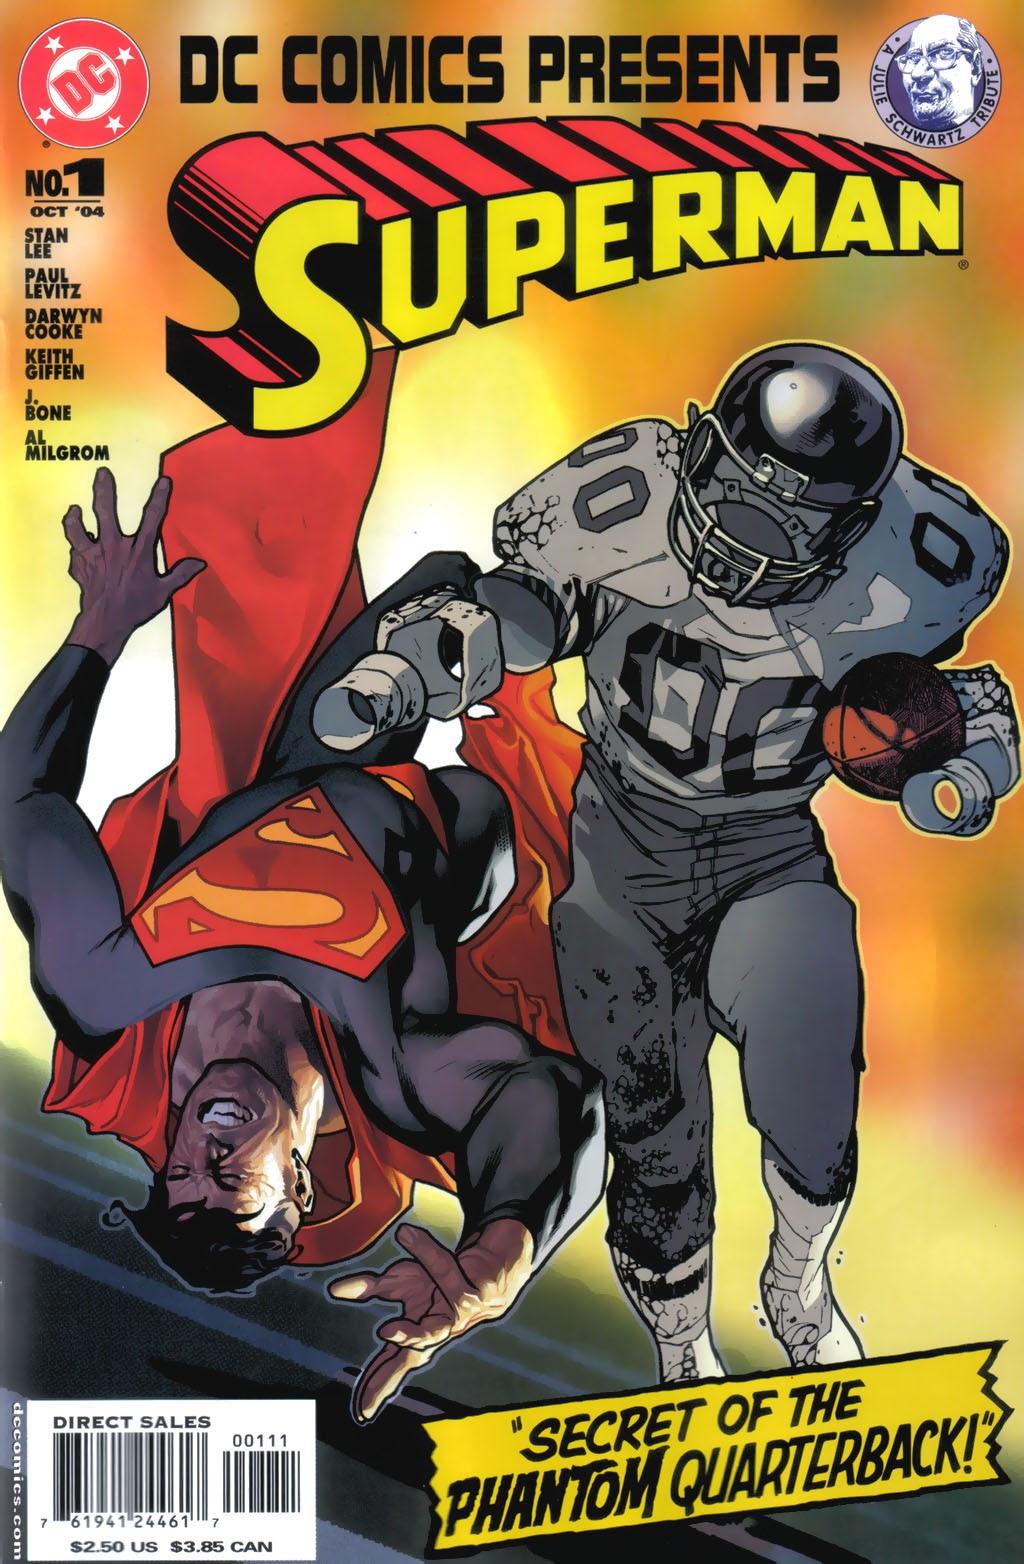 DC Comics Presents (2004) Superman Page 1